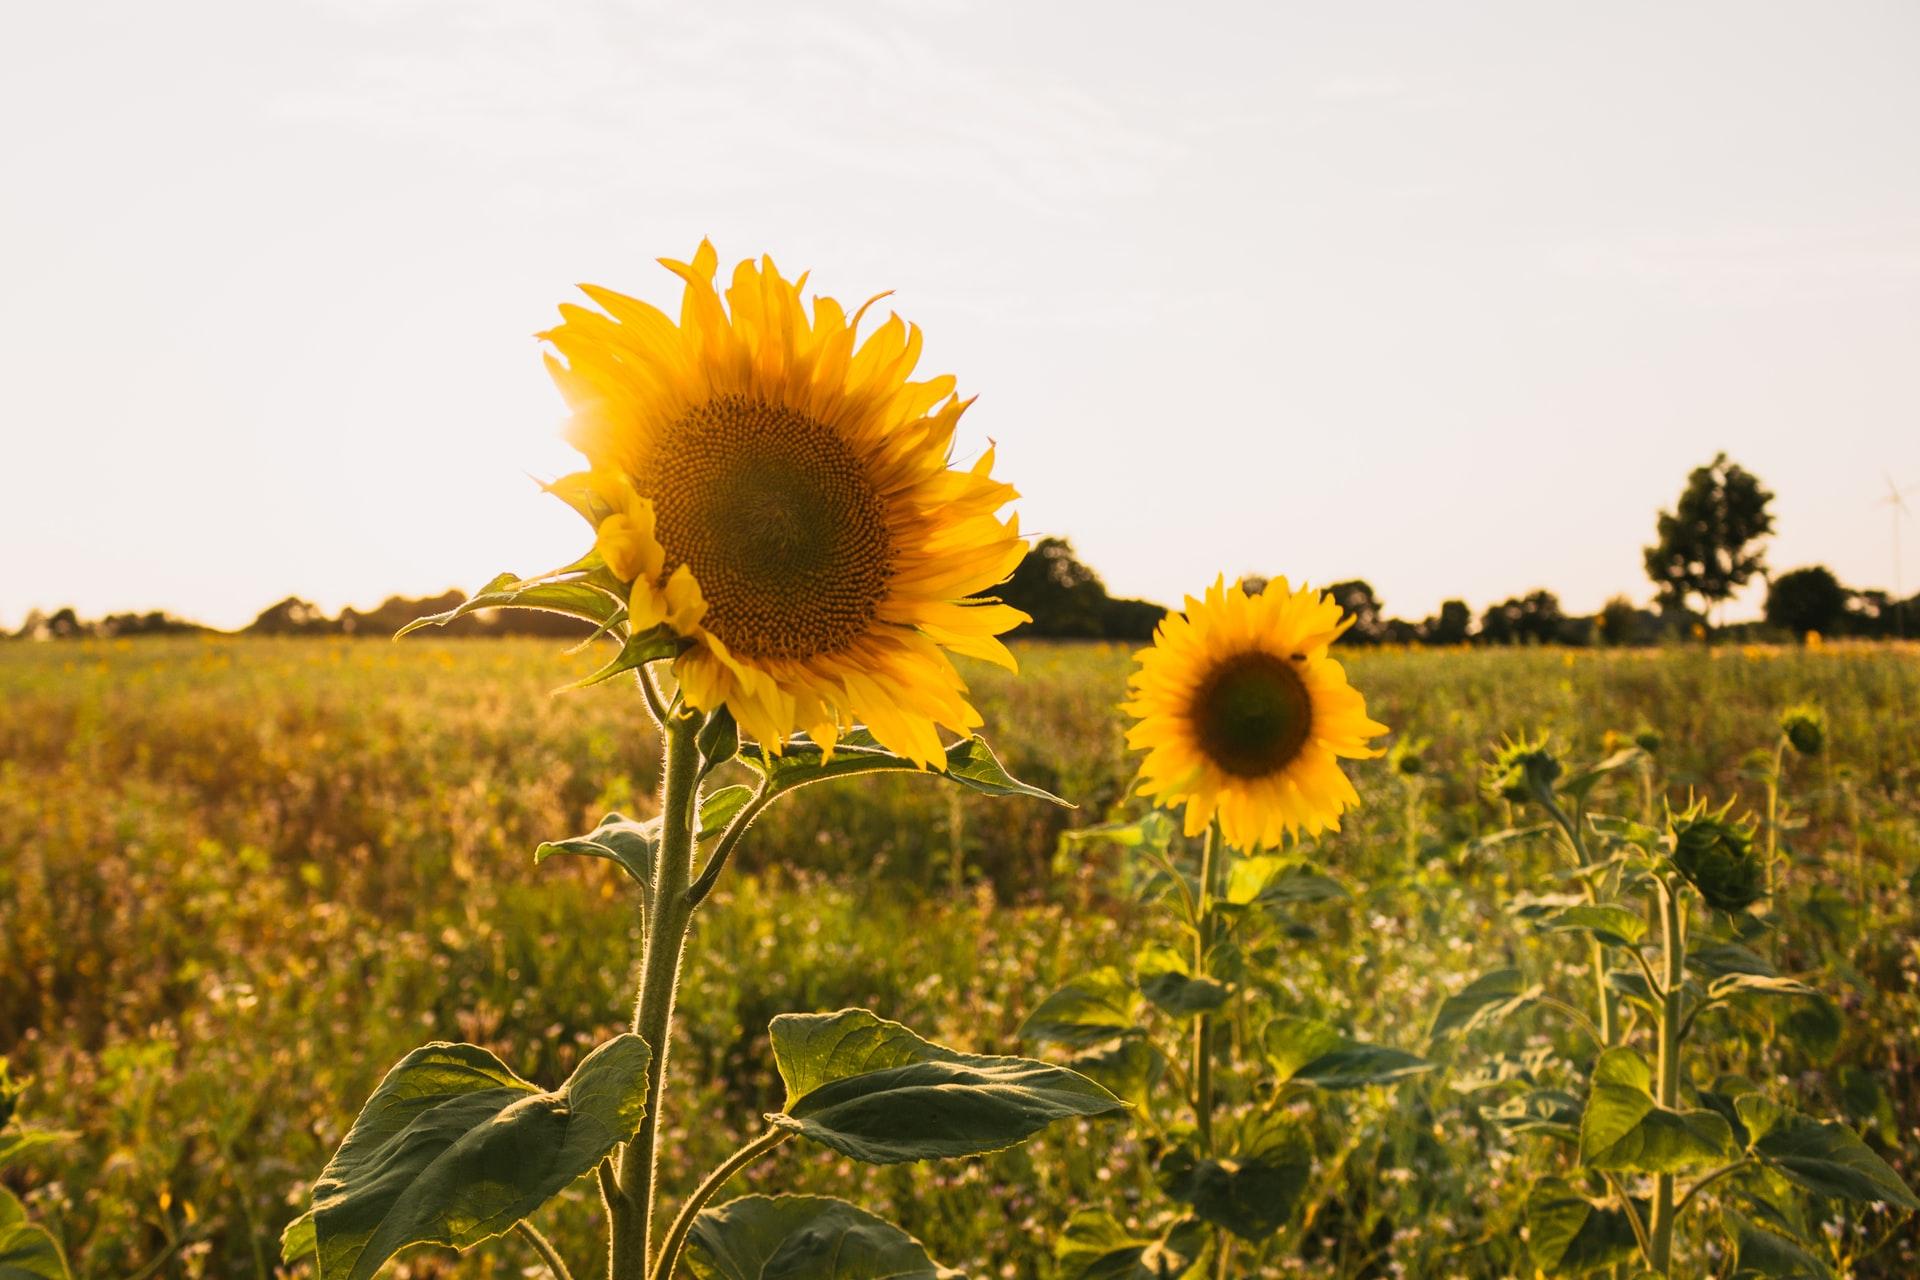 Chattanooga Area Sunflower Fields (2)